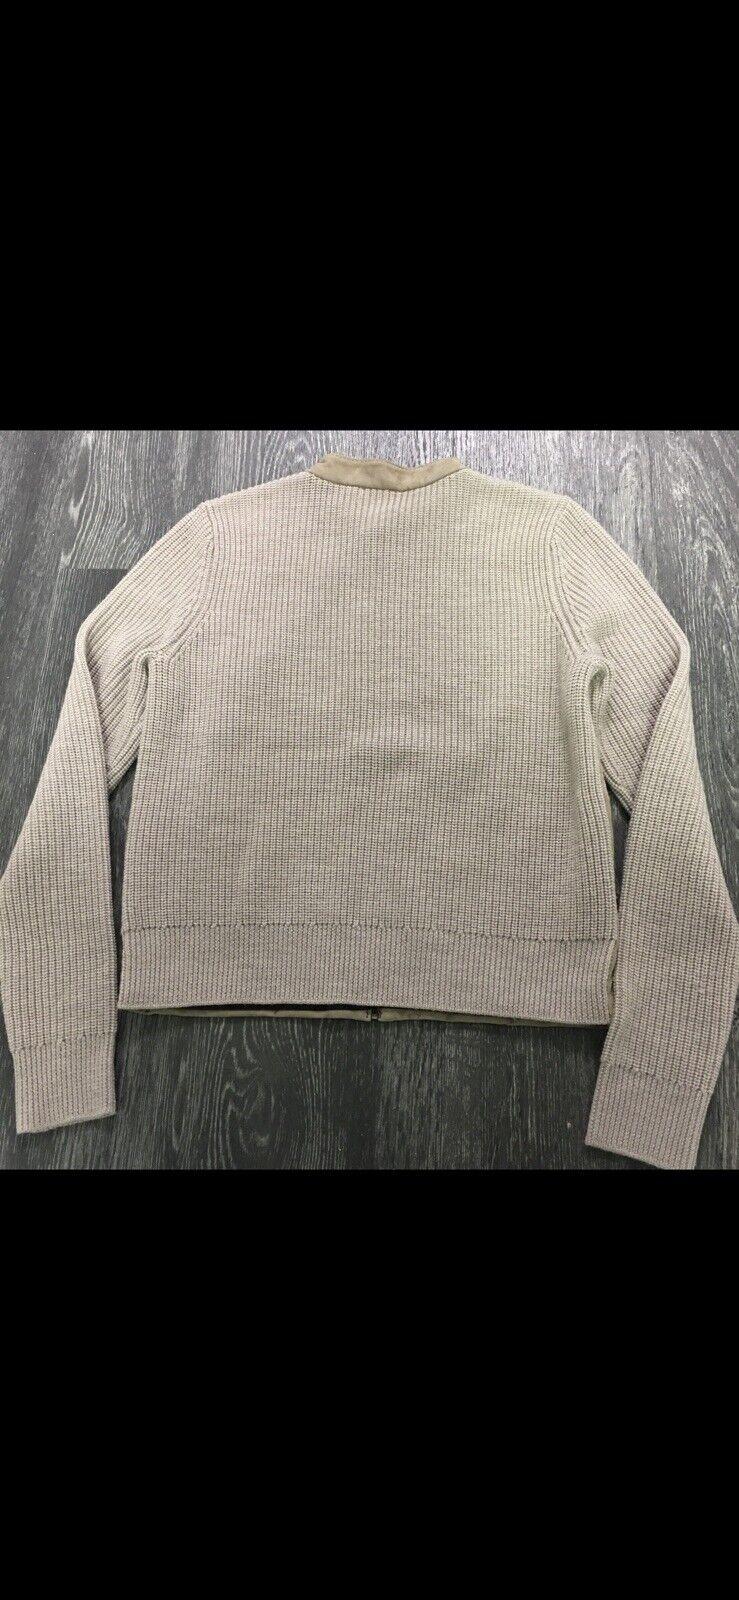 Tory Burch Wool/Suede Cardigan Blazer Size Small  - image 3